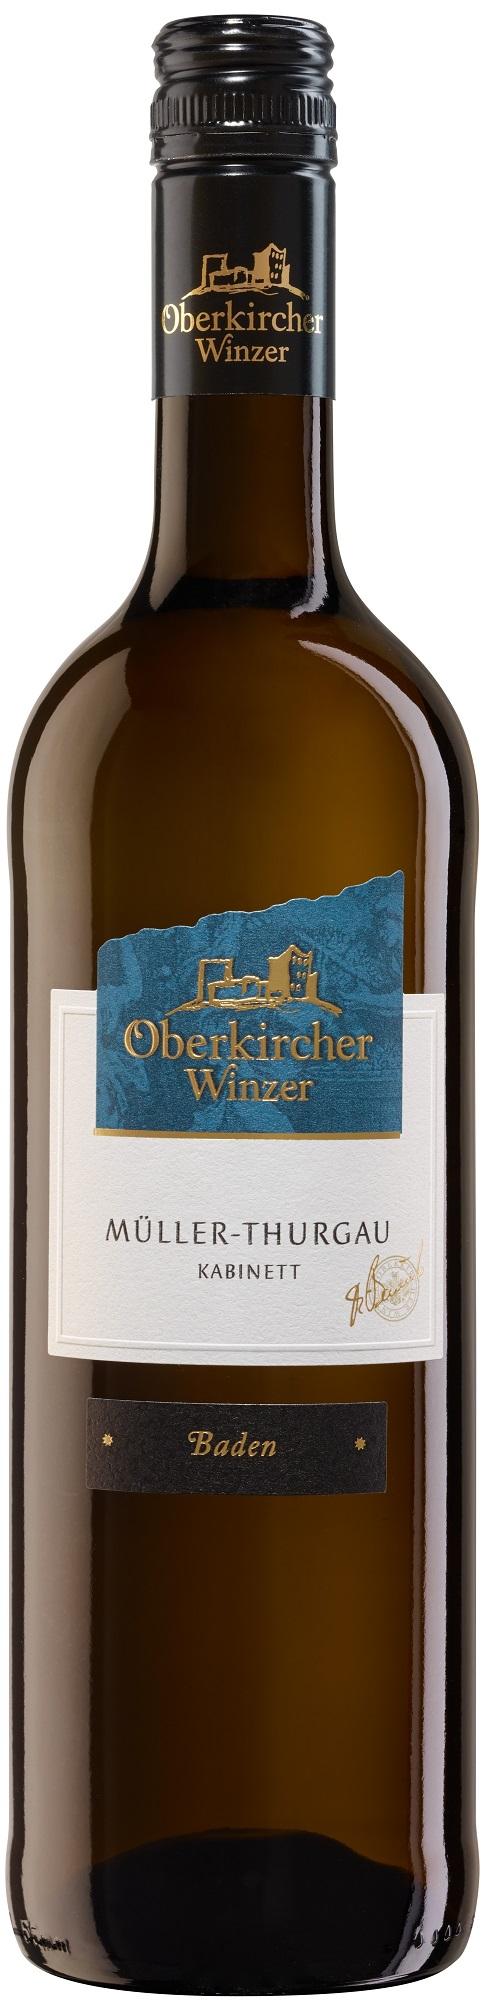 Collection Oberkirch, Müller Thurgau Kabinett